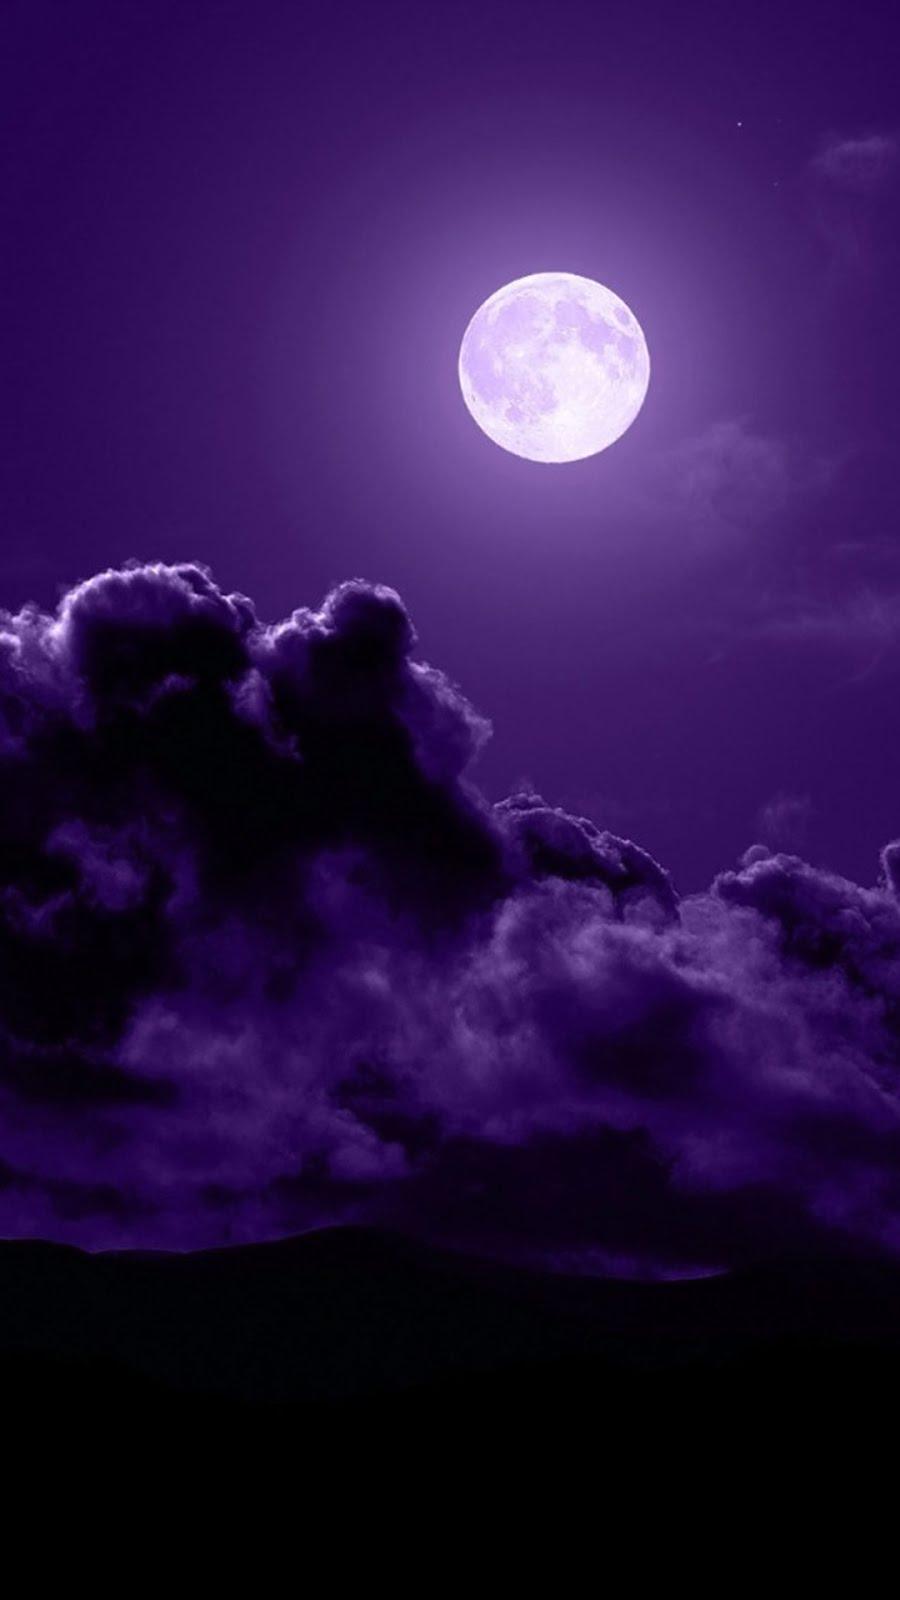 Iphone7 Iphone6 壁紙box 幻想的な紫の月 壁紙